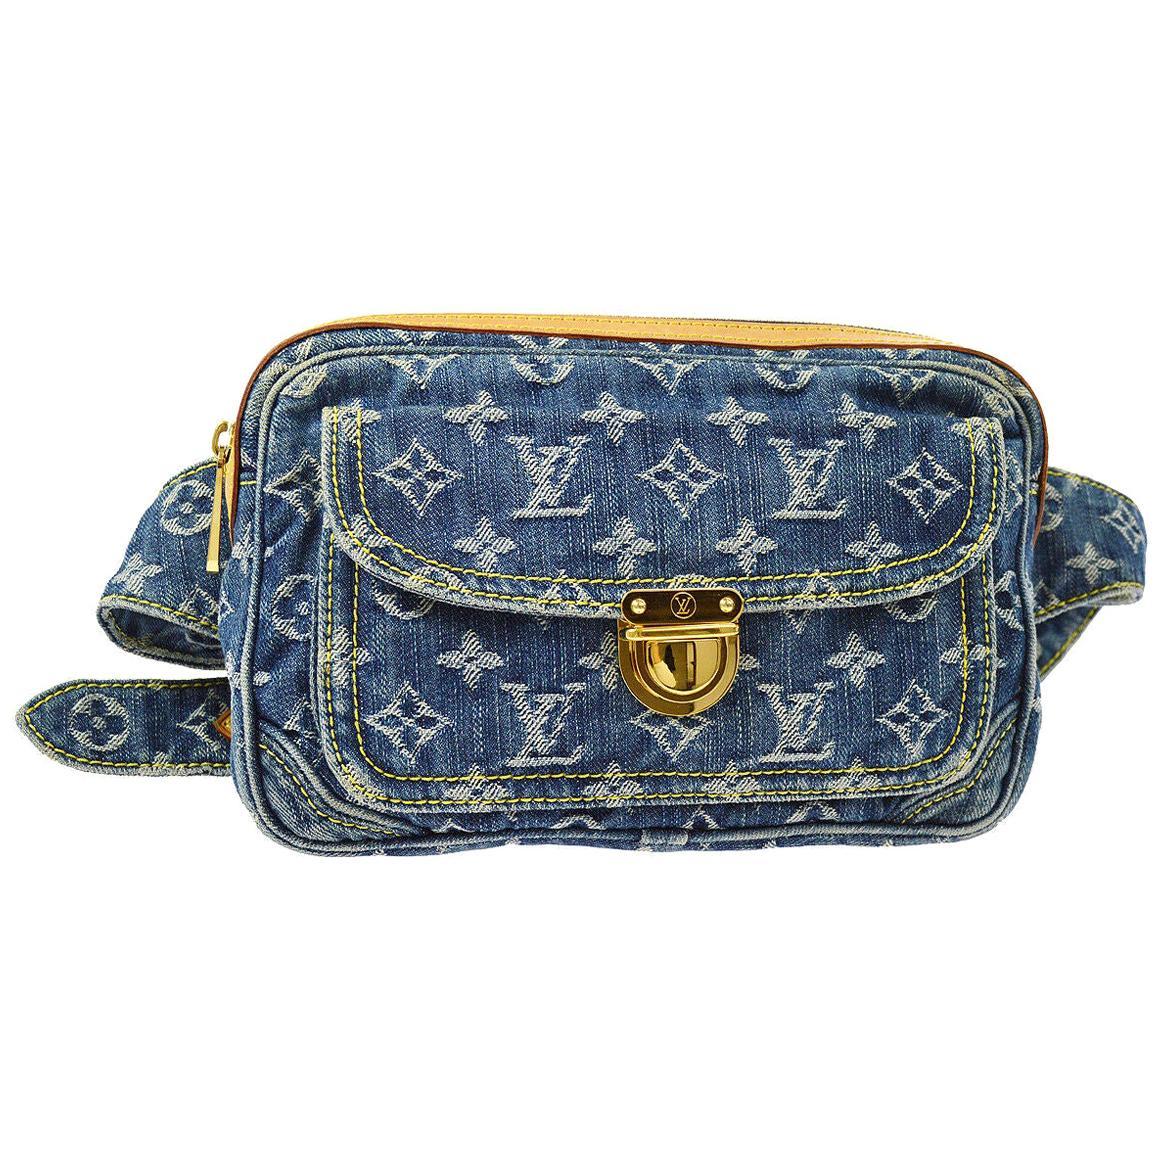 Louis Vuitton Blue Jean Monogram Bum Fanny Pack Waist Belt Bag